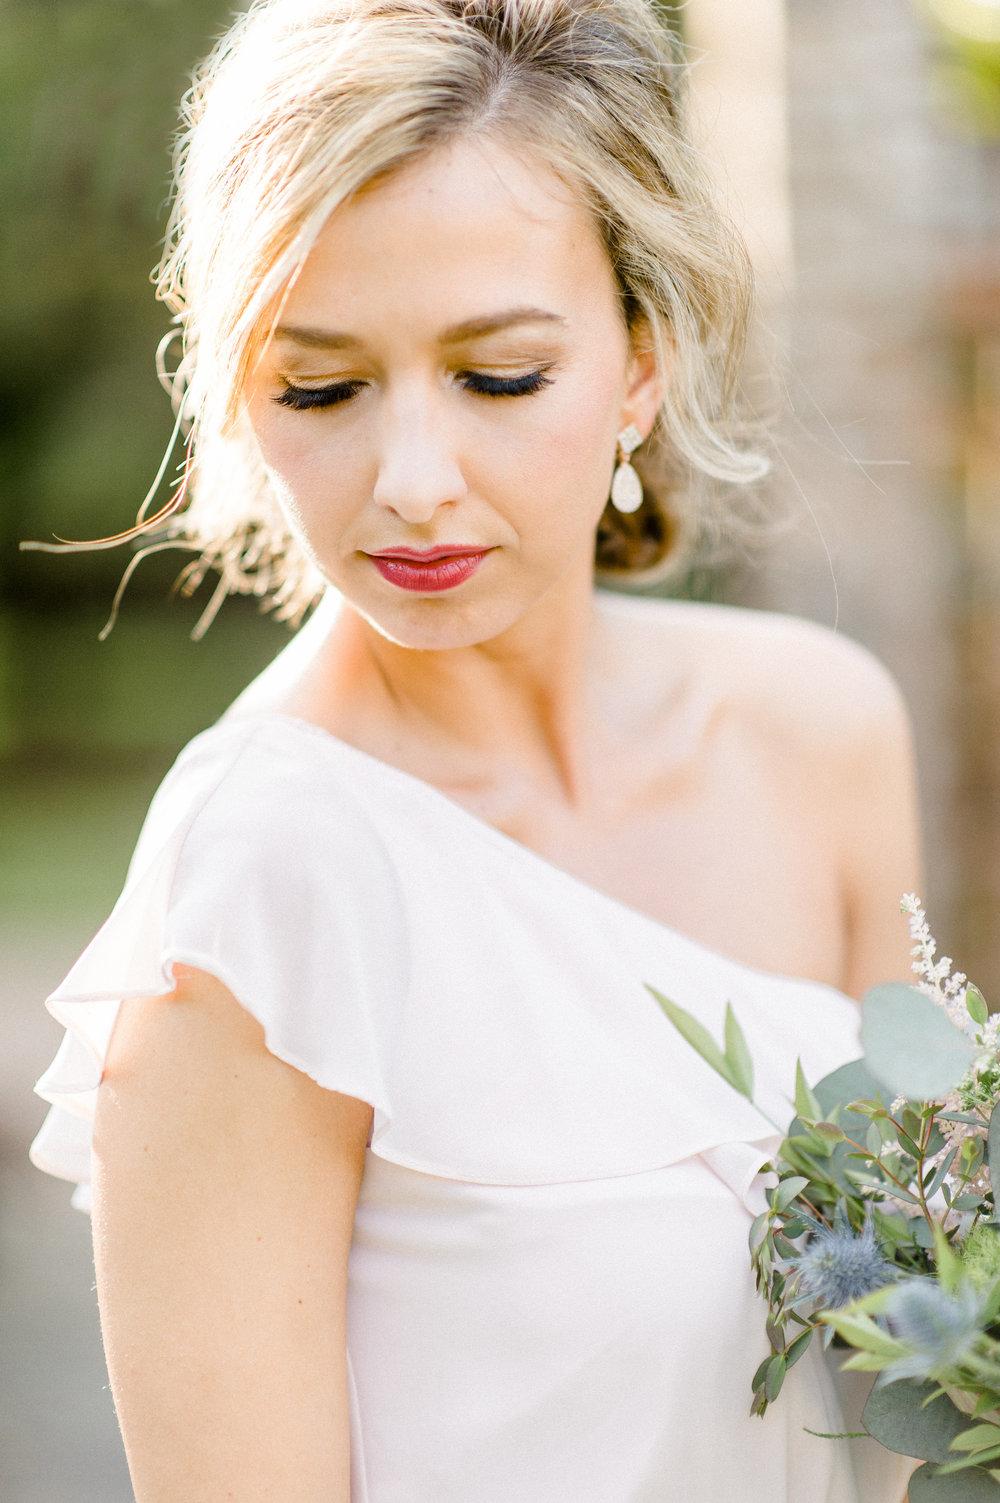 CarolineLimaPhotography_TheSutherland_Editorial_2016_219.jpg